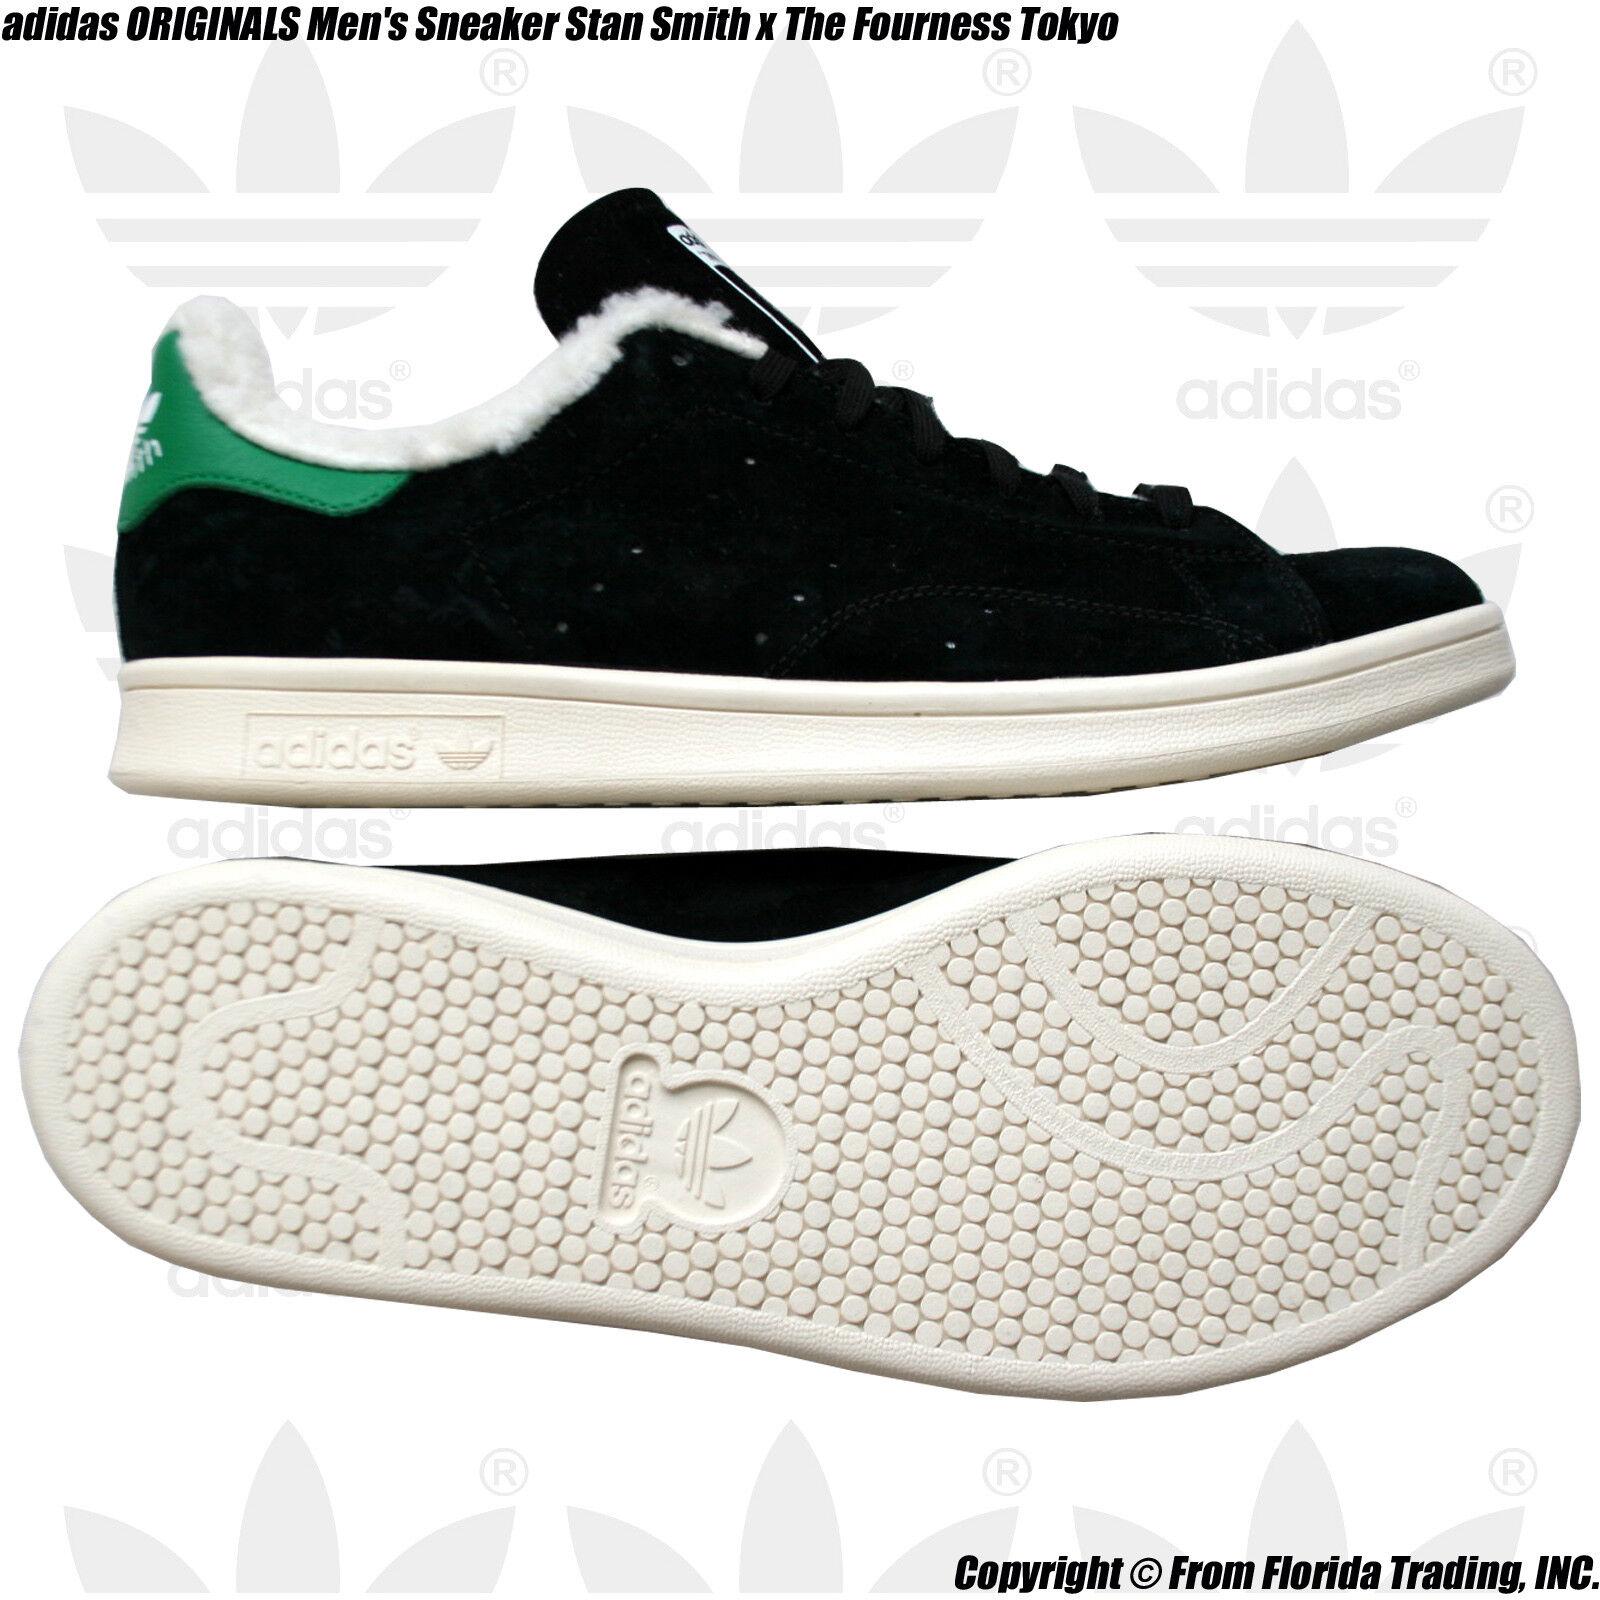 adidas ORIGINALS Men's Sneaker Stan Smith x The Fourness Tokyo(9/27cm)Black